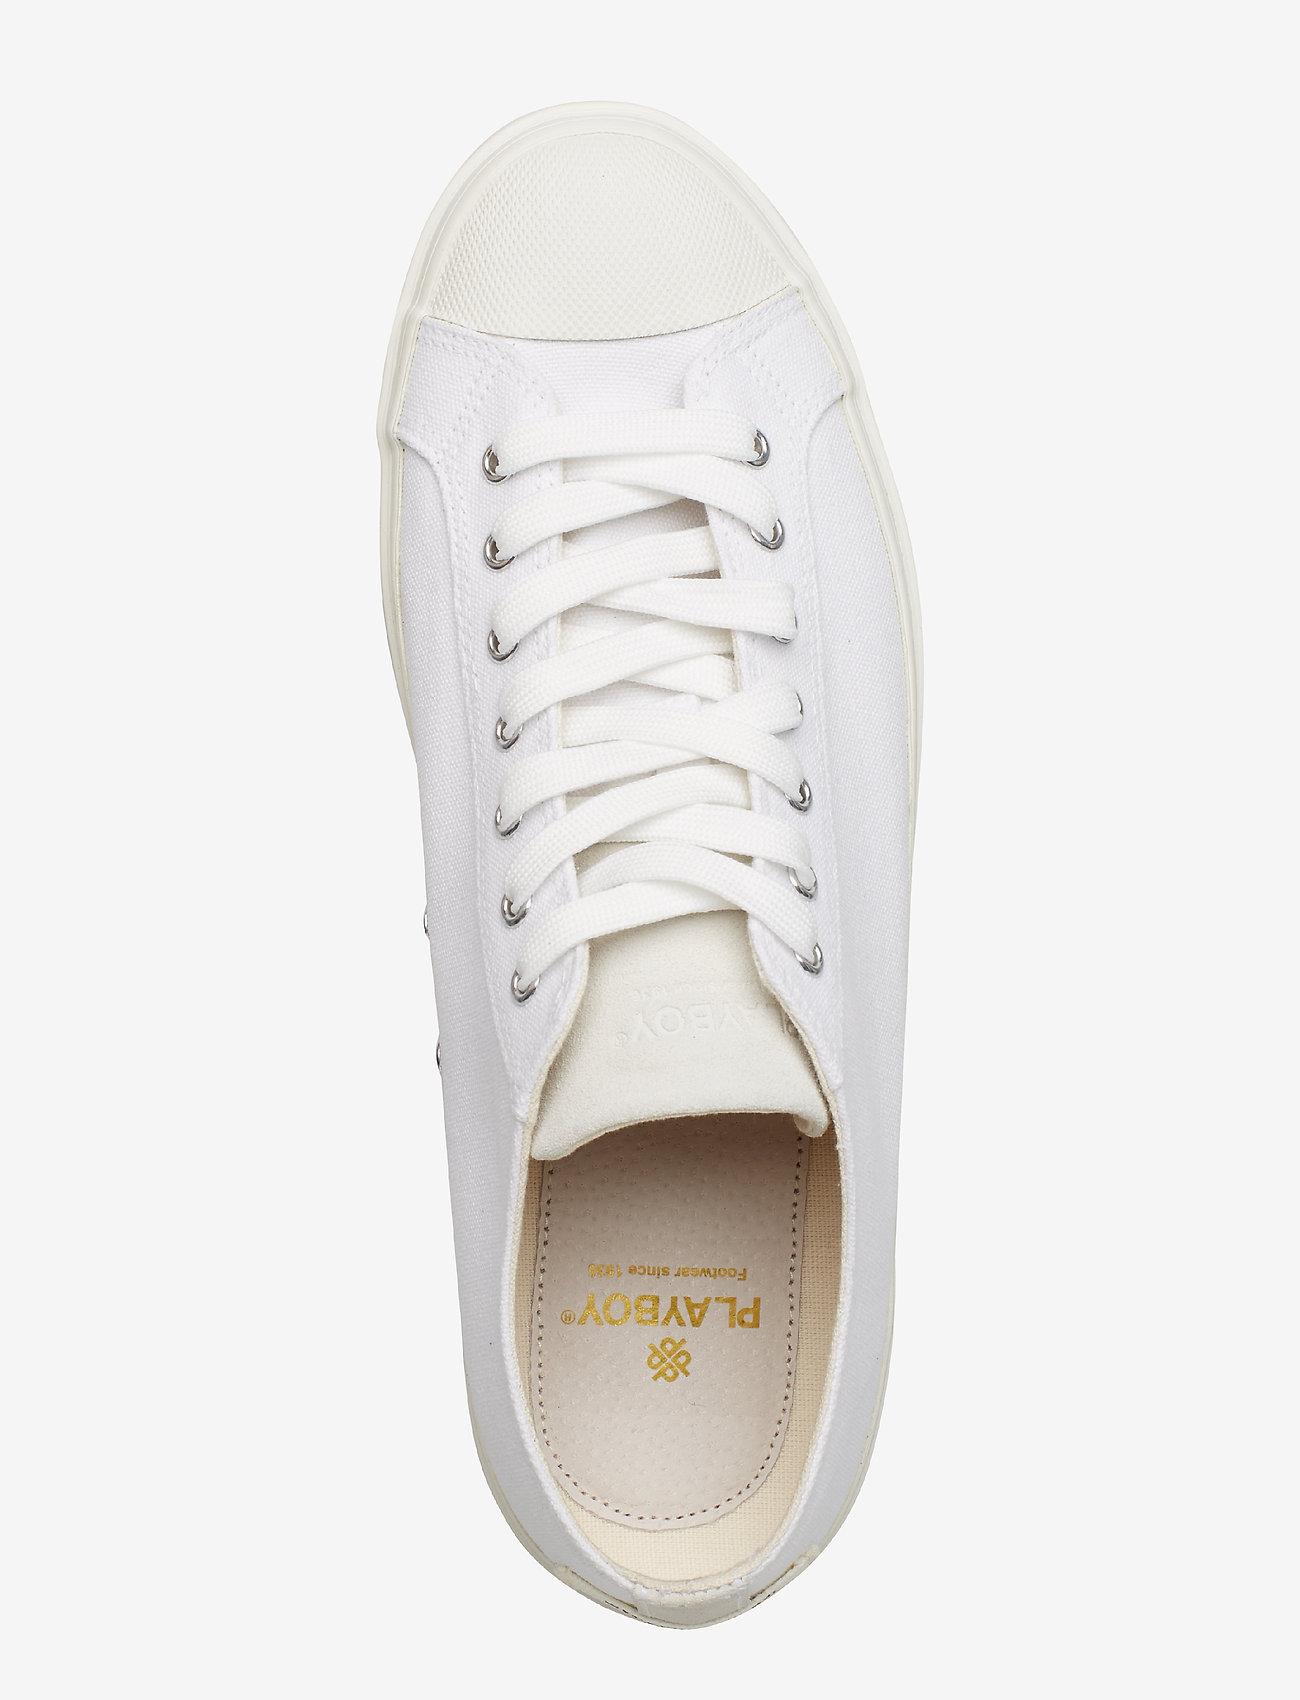 Alfred (White) - Playboy Footwear